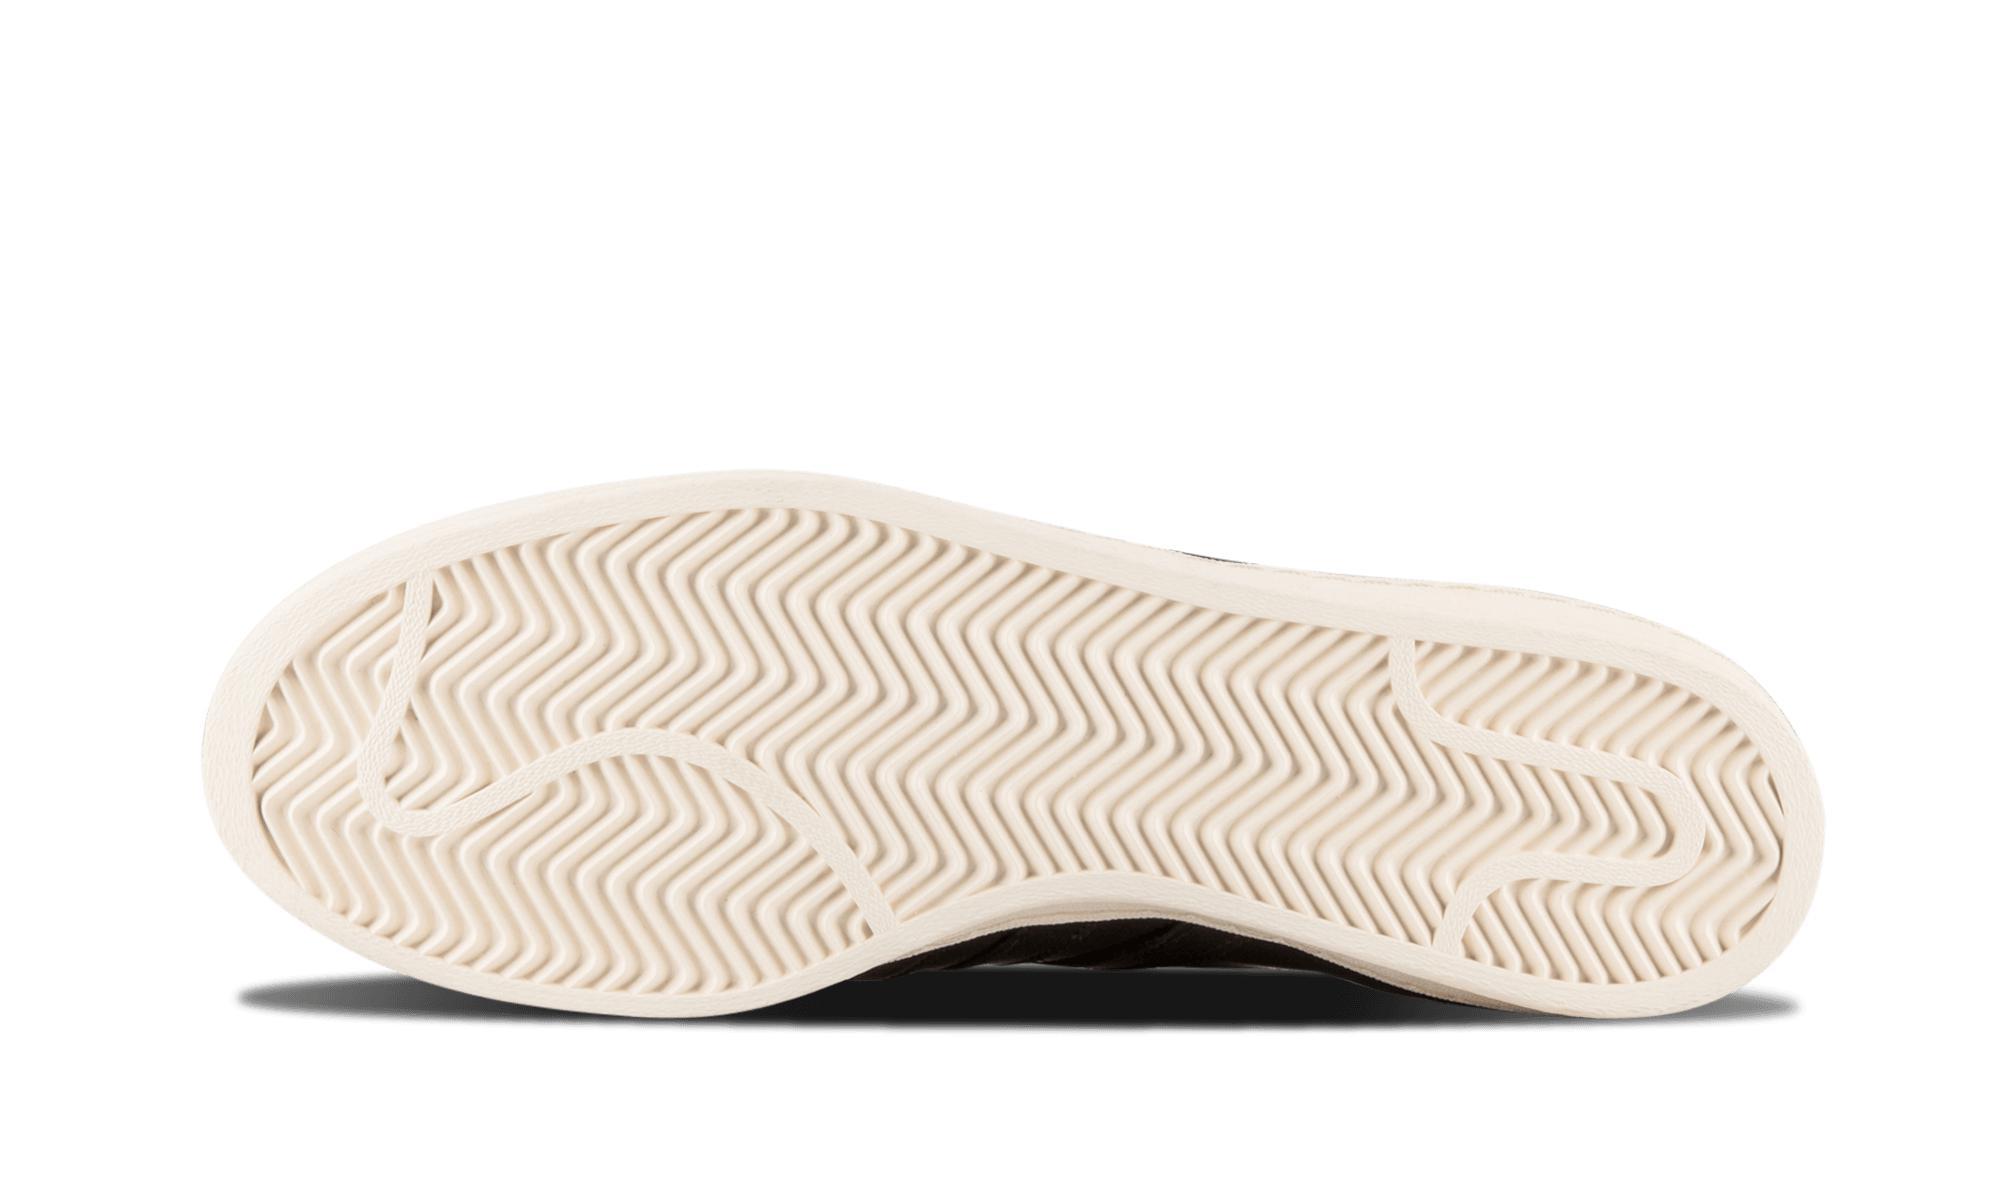 Adidas - Black Bw Campus 80s for Men - Lyst. View fullscreen 45ffe9d9d